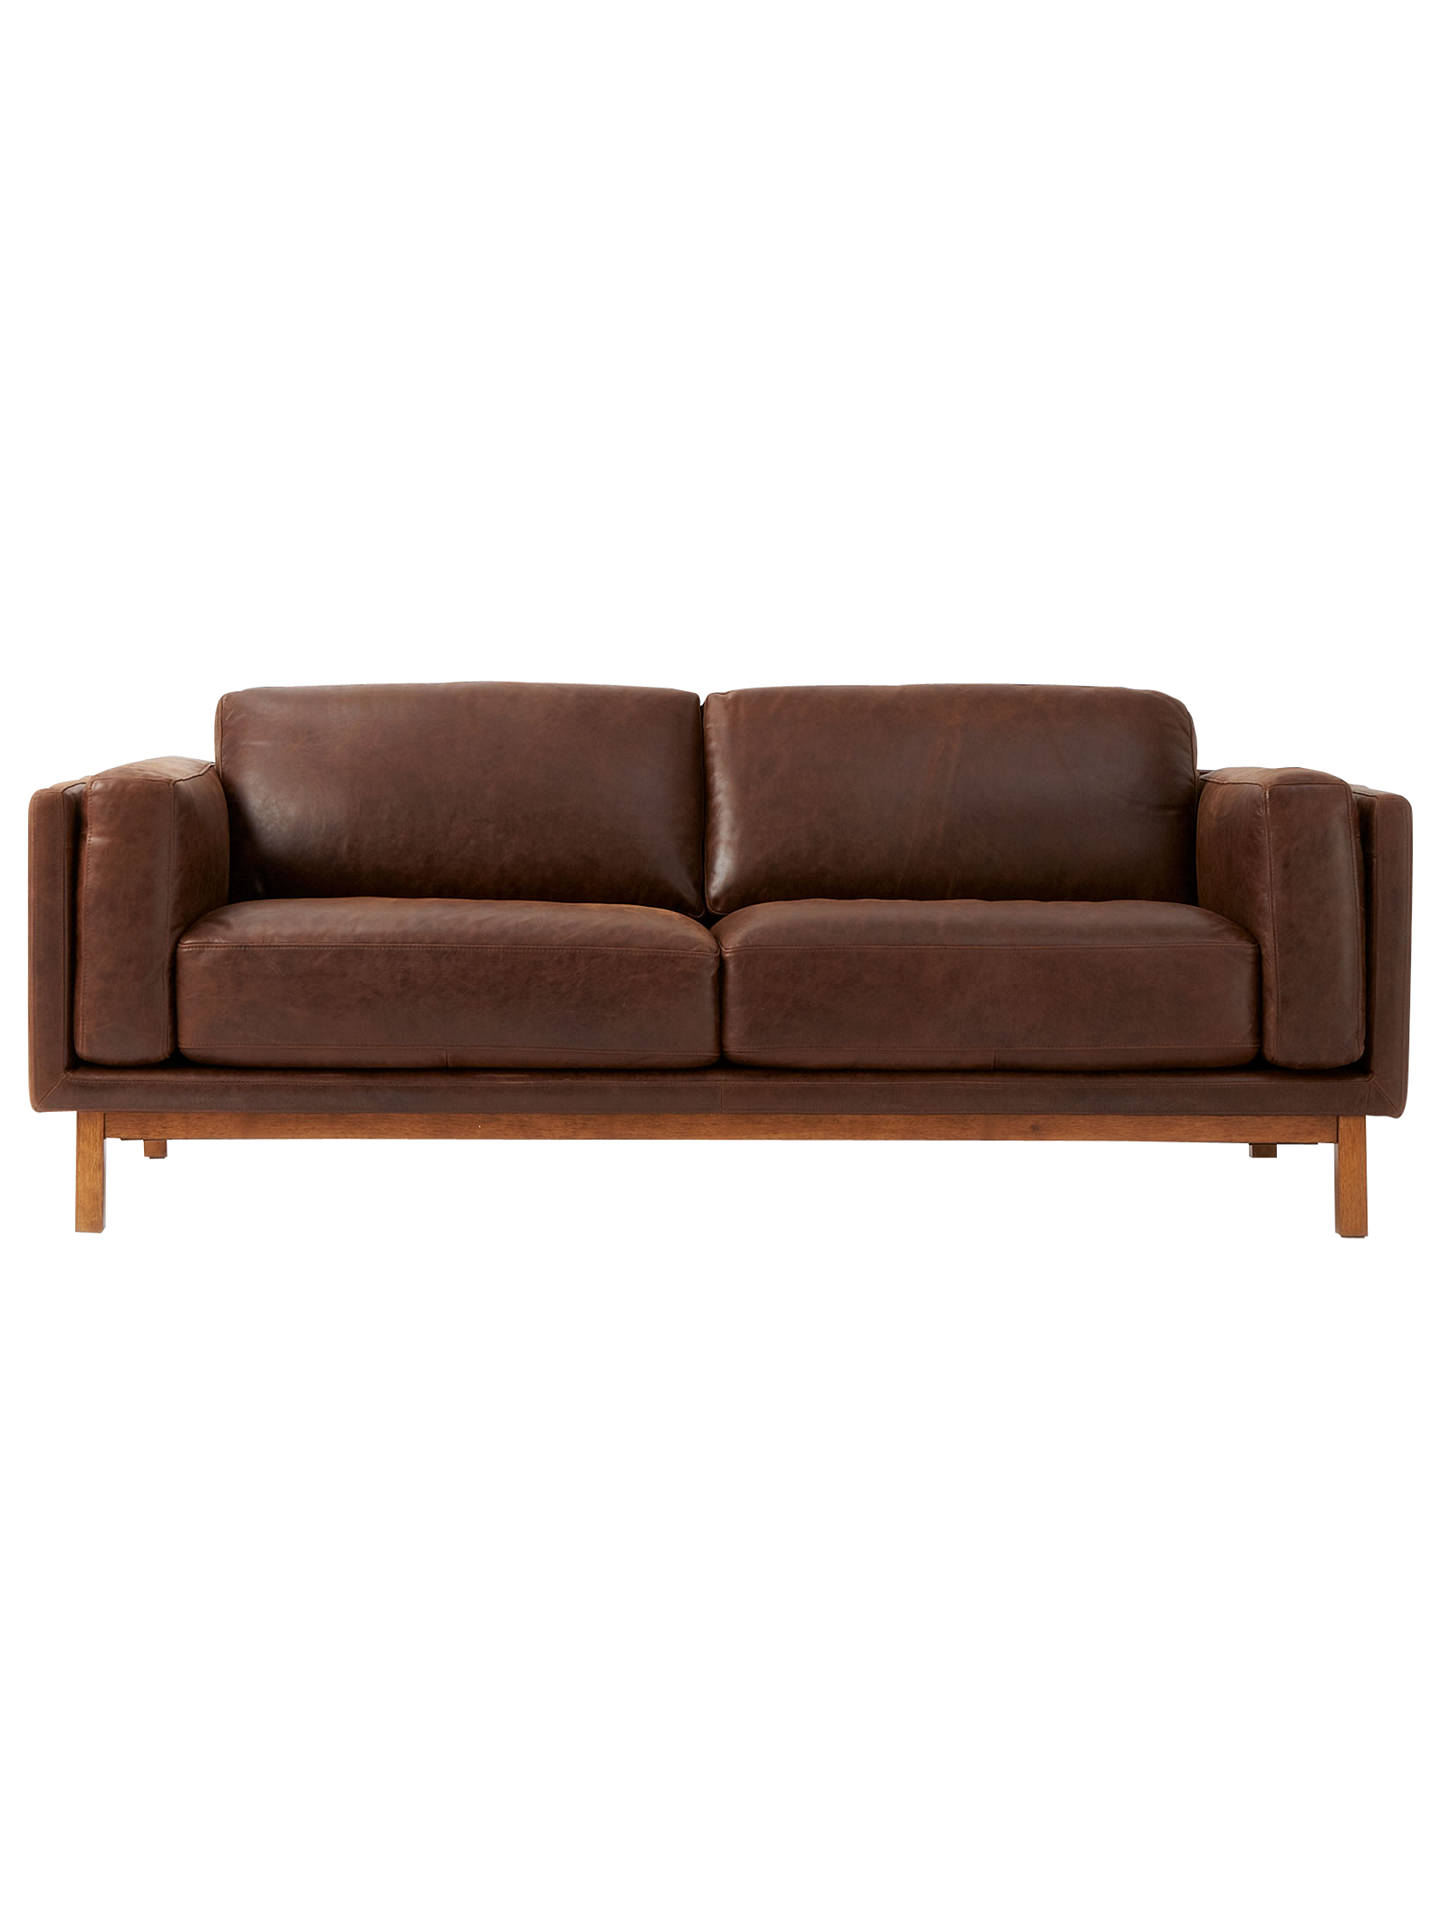 West Elm Dekalb Aniline Leather Sofa Moles Online At Johnlewis